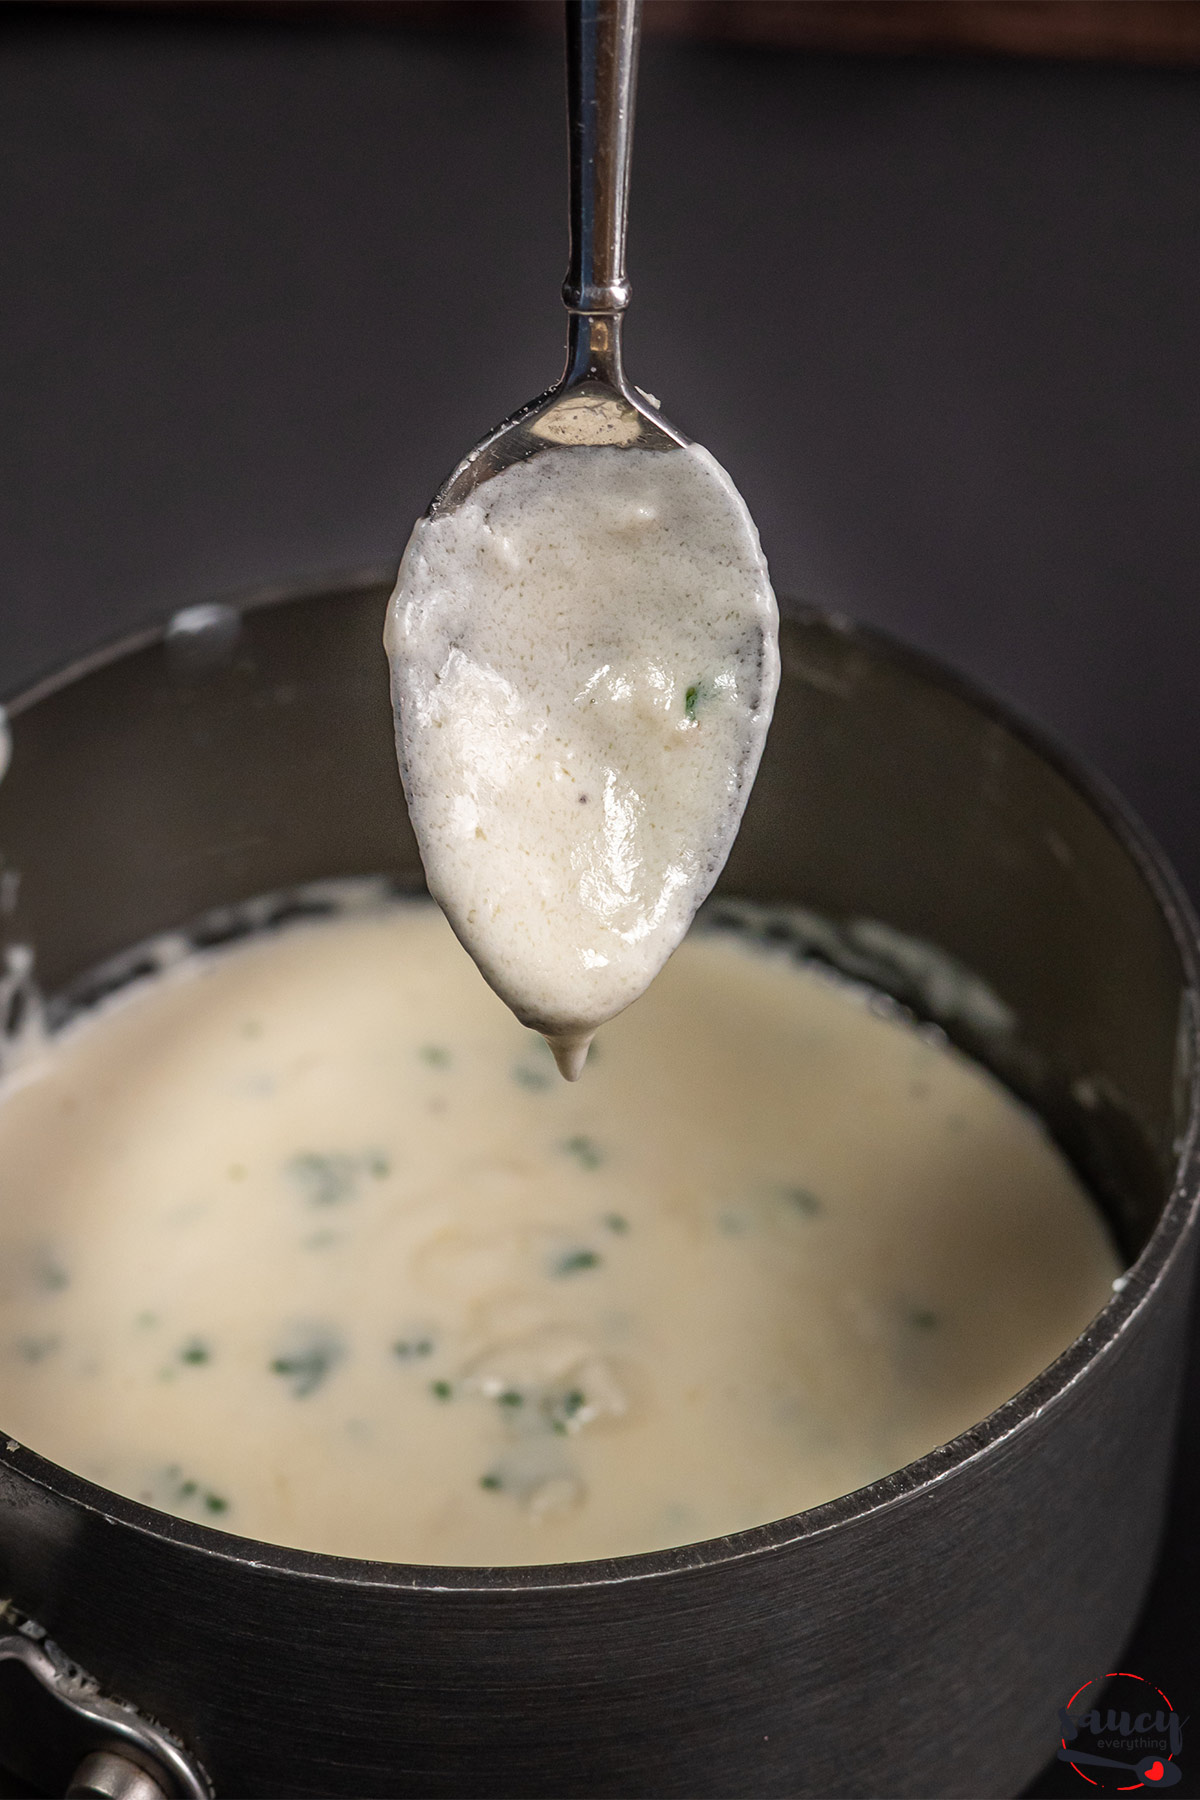 Dripping garlic cream sauce off a spoon